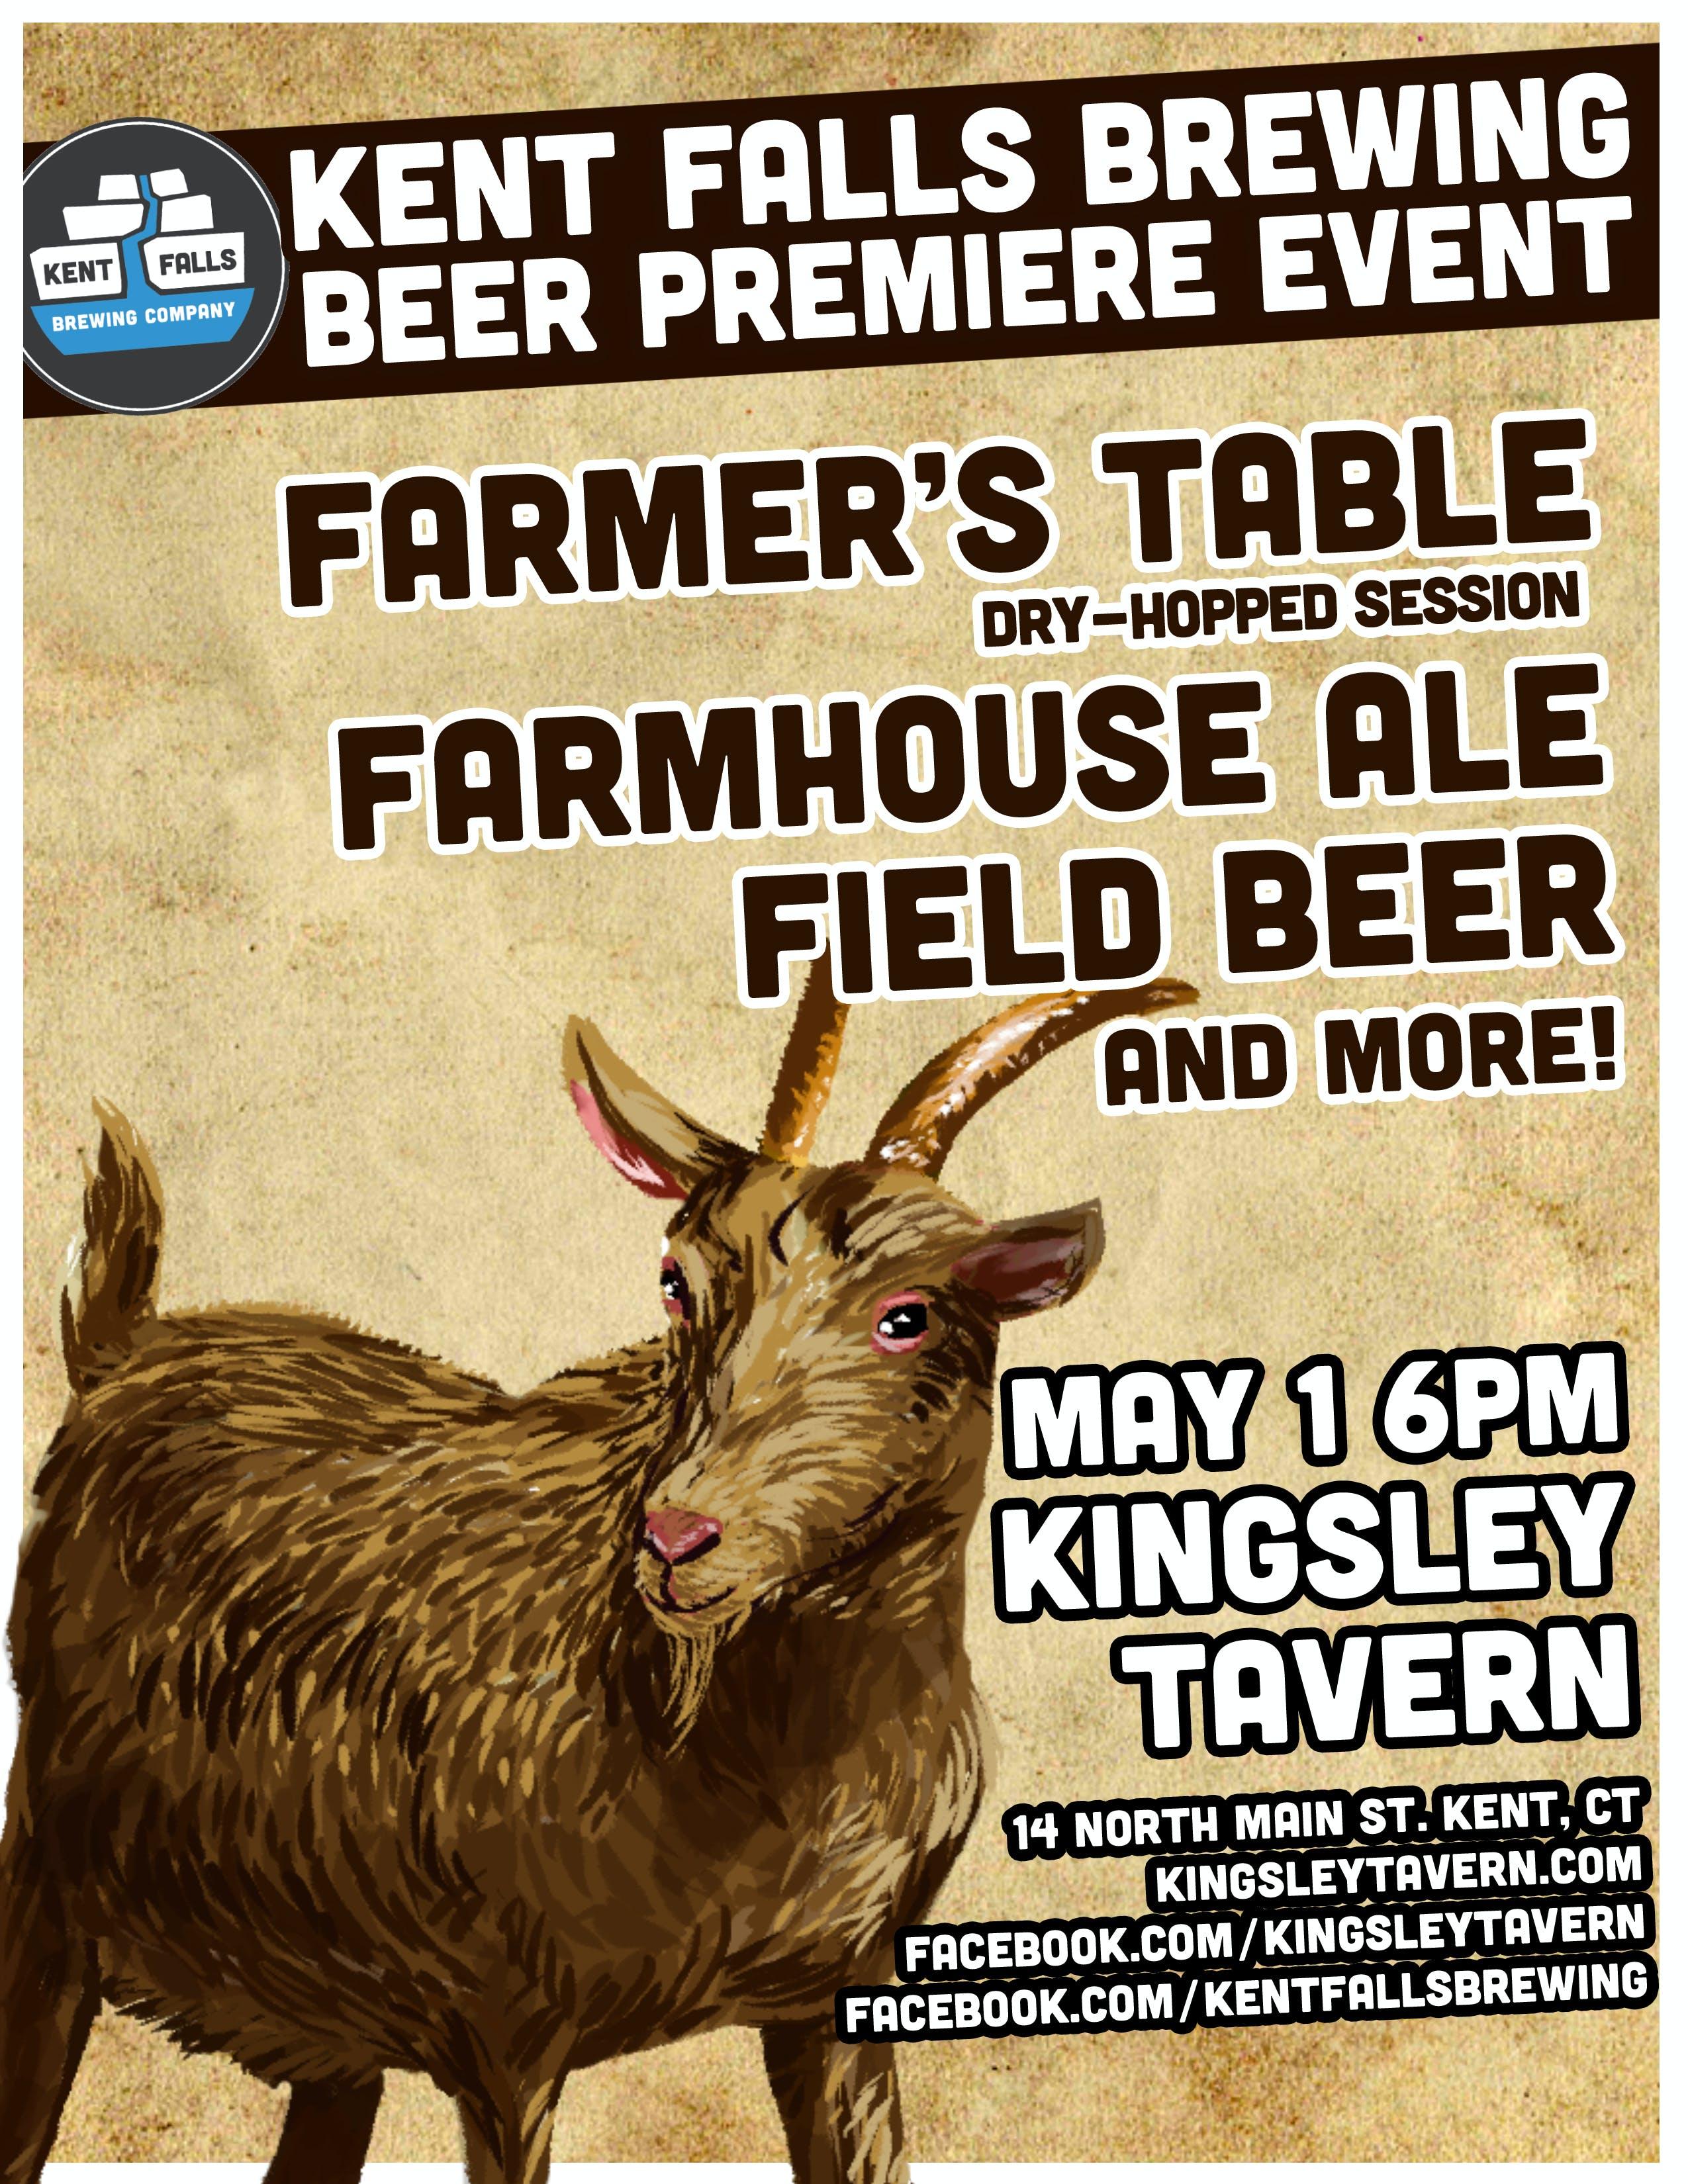 Beer Release Flyer Kingsley Tavern ver 1b